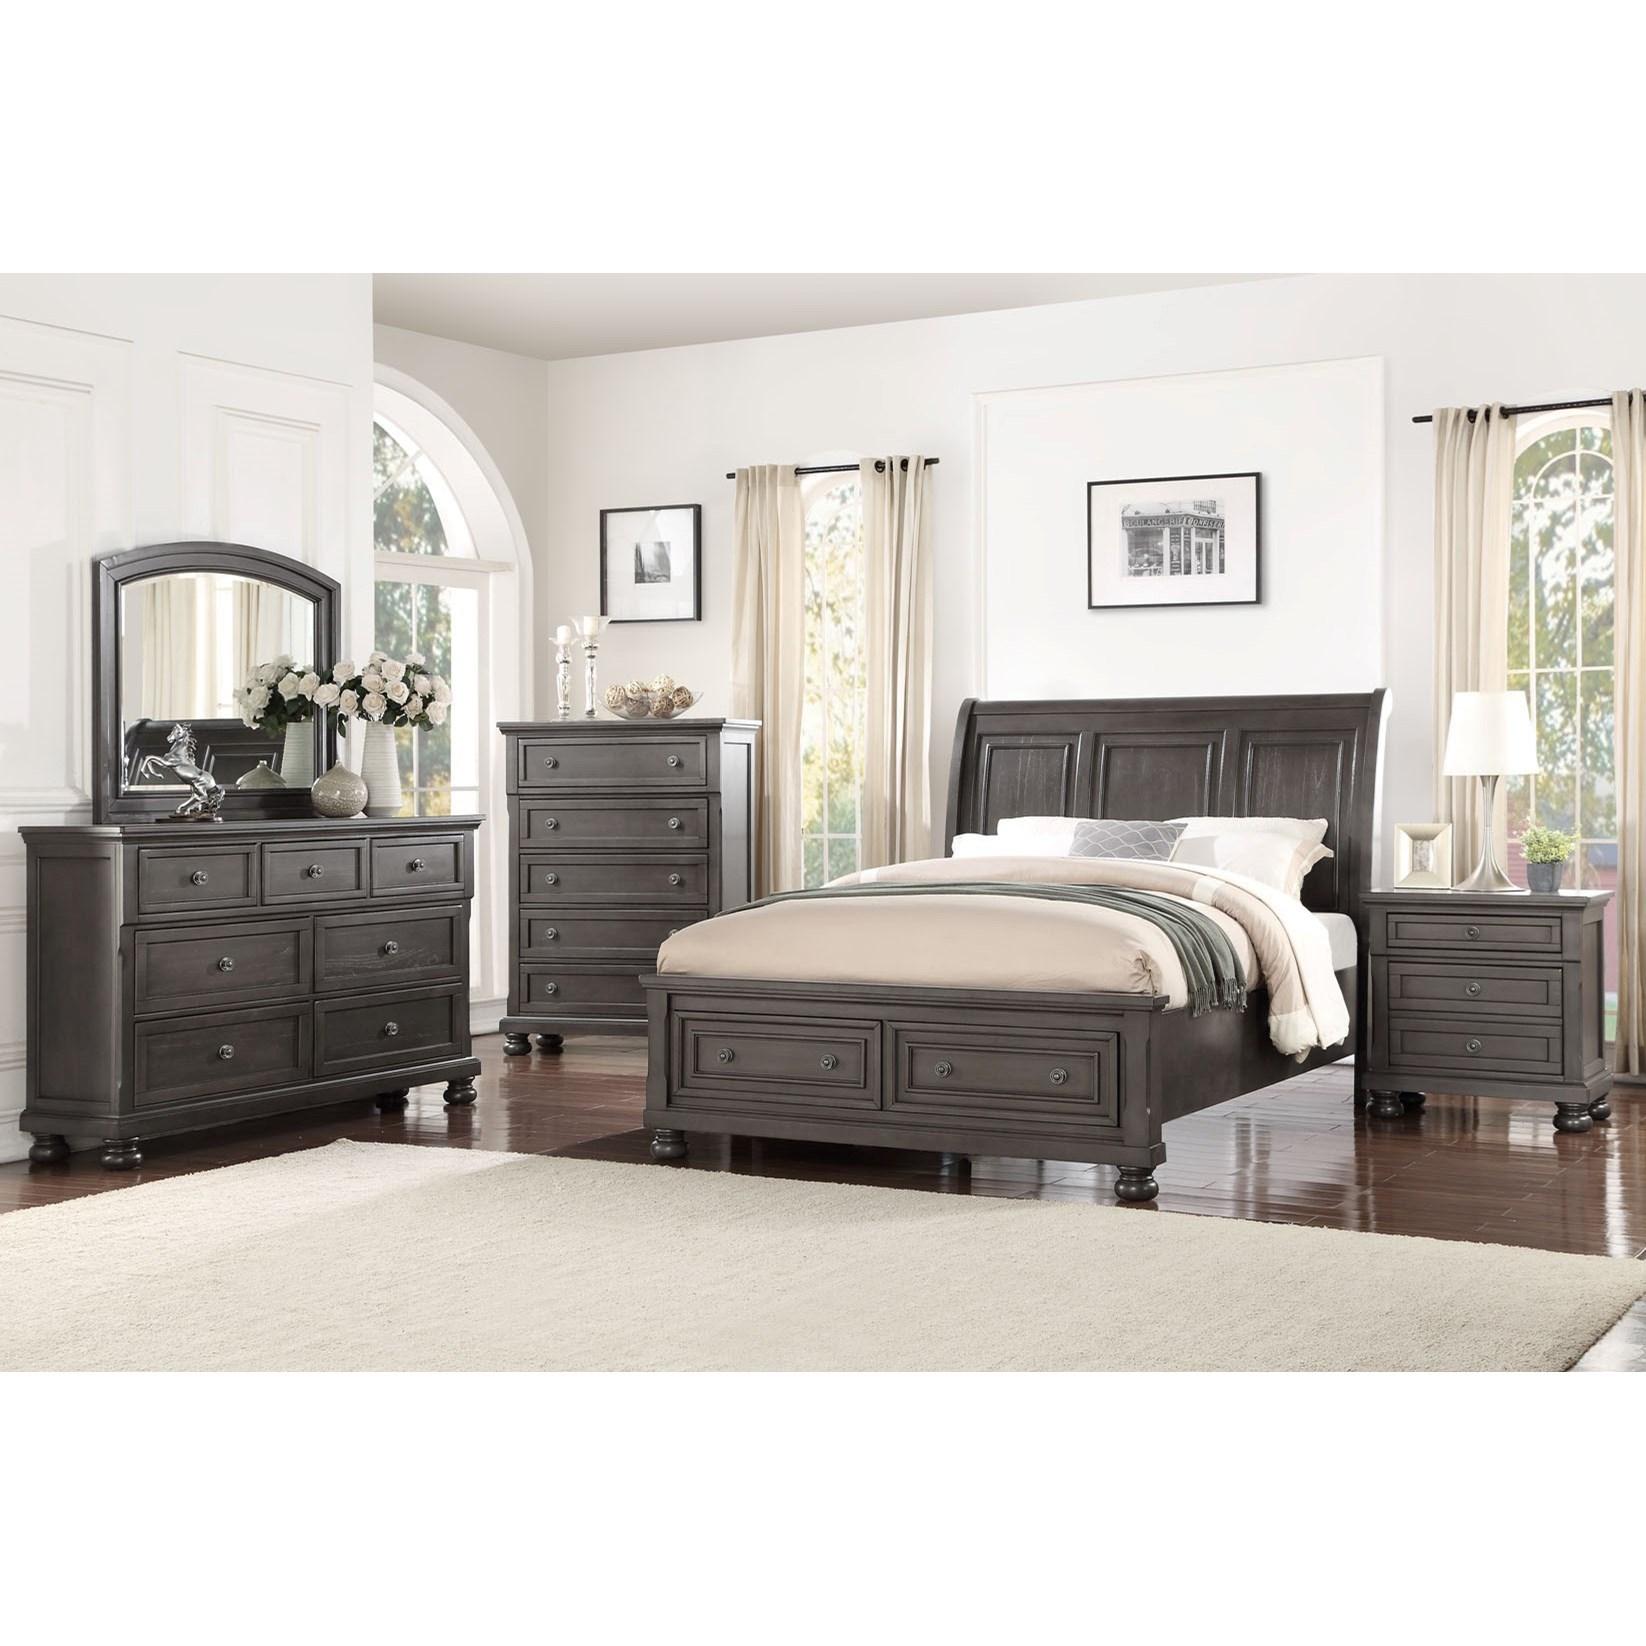 Charmant Avalon Furniture Sophia B01061King Bedroom Group